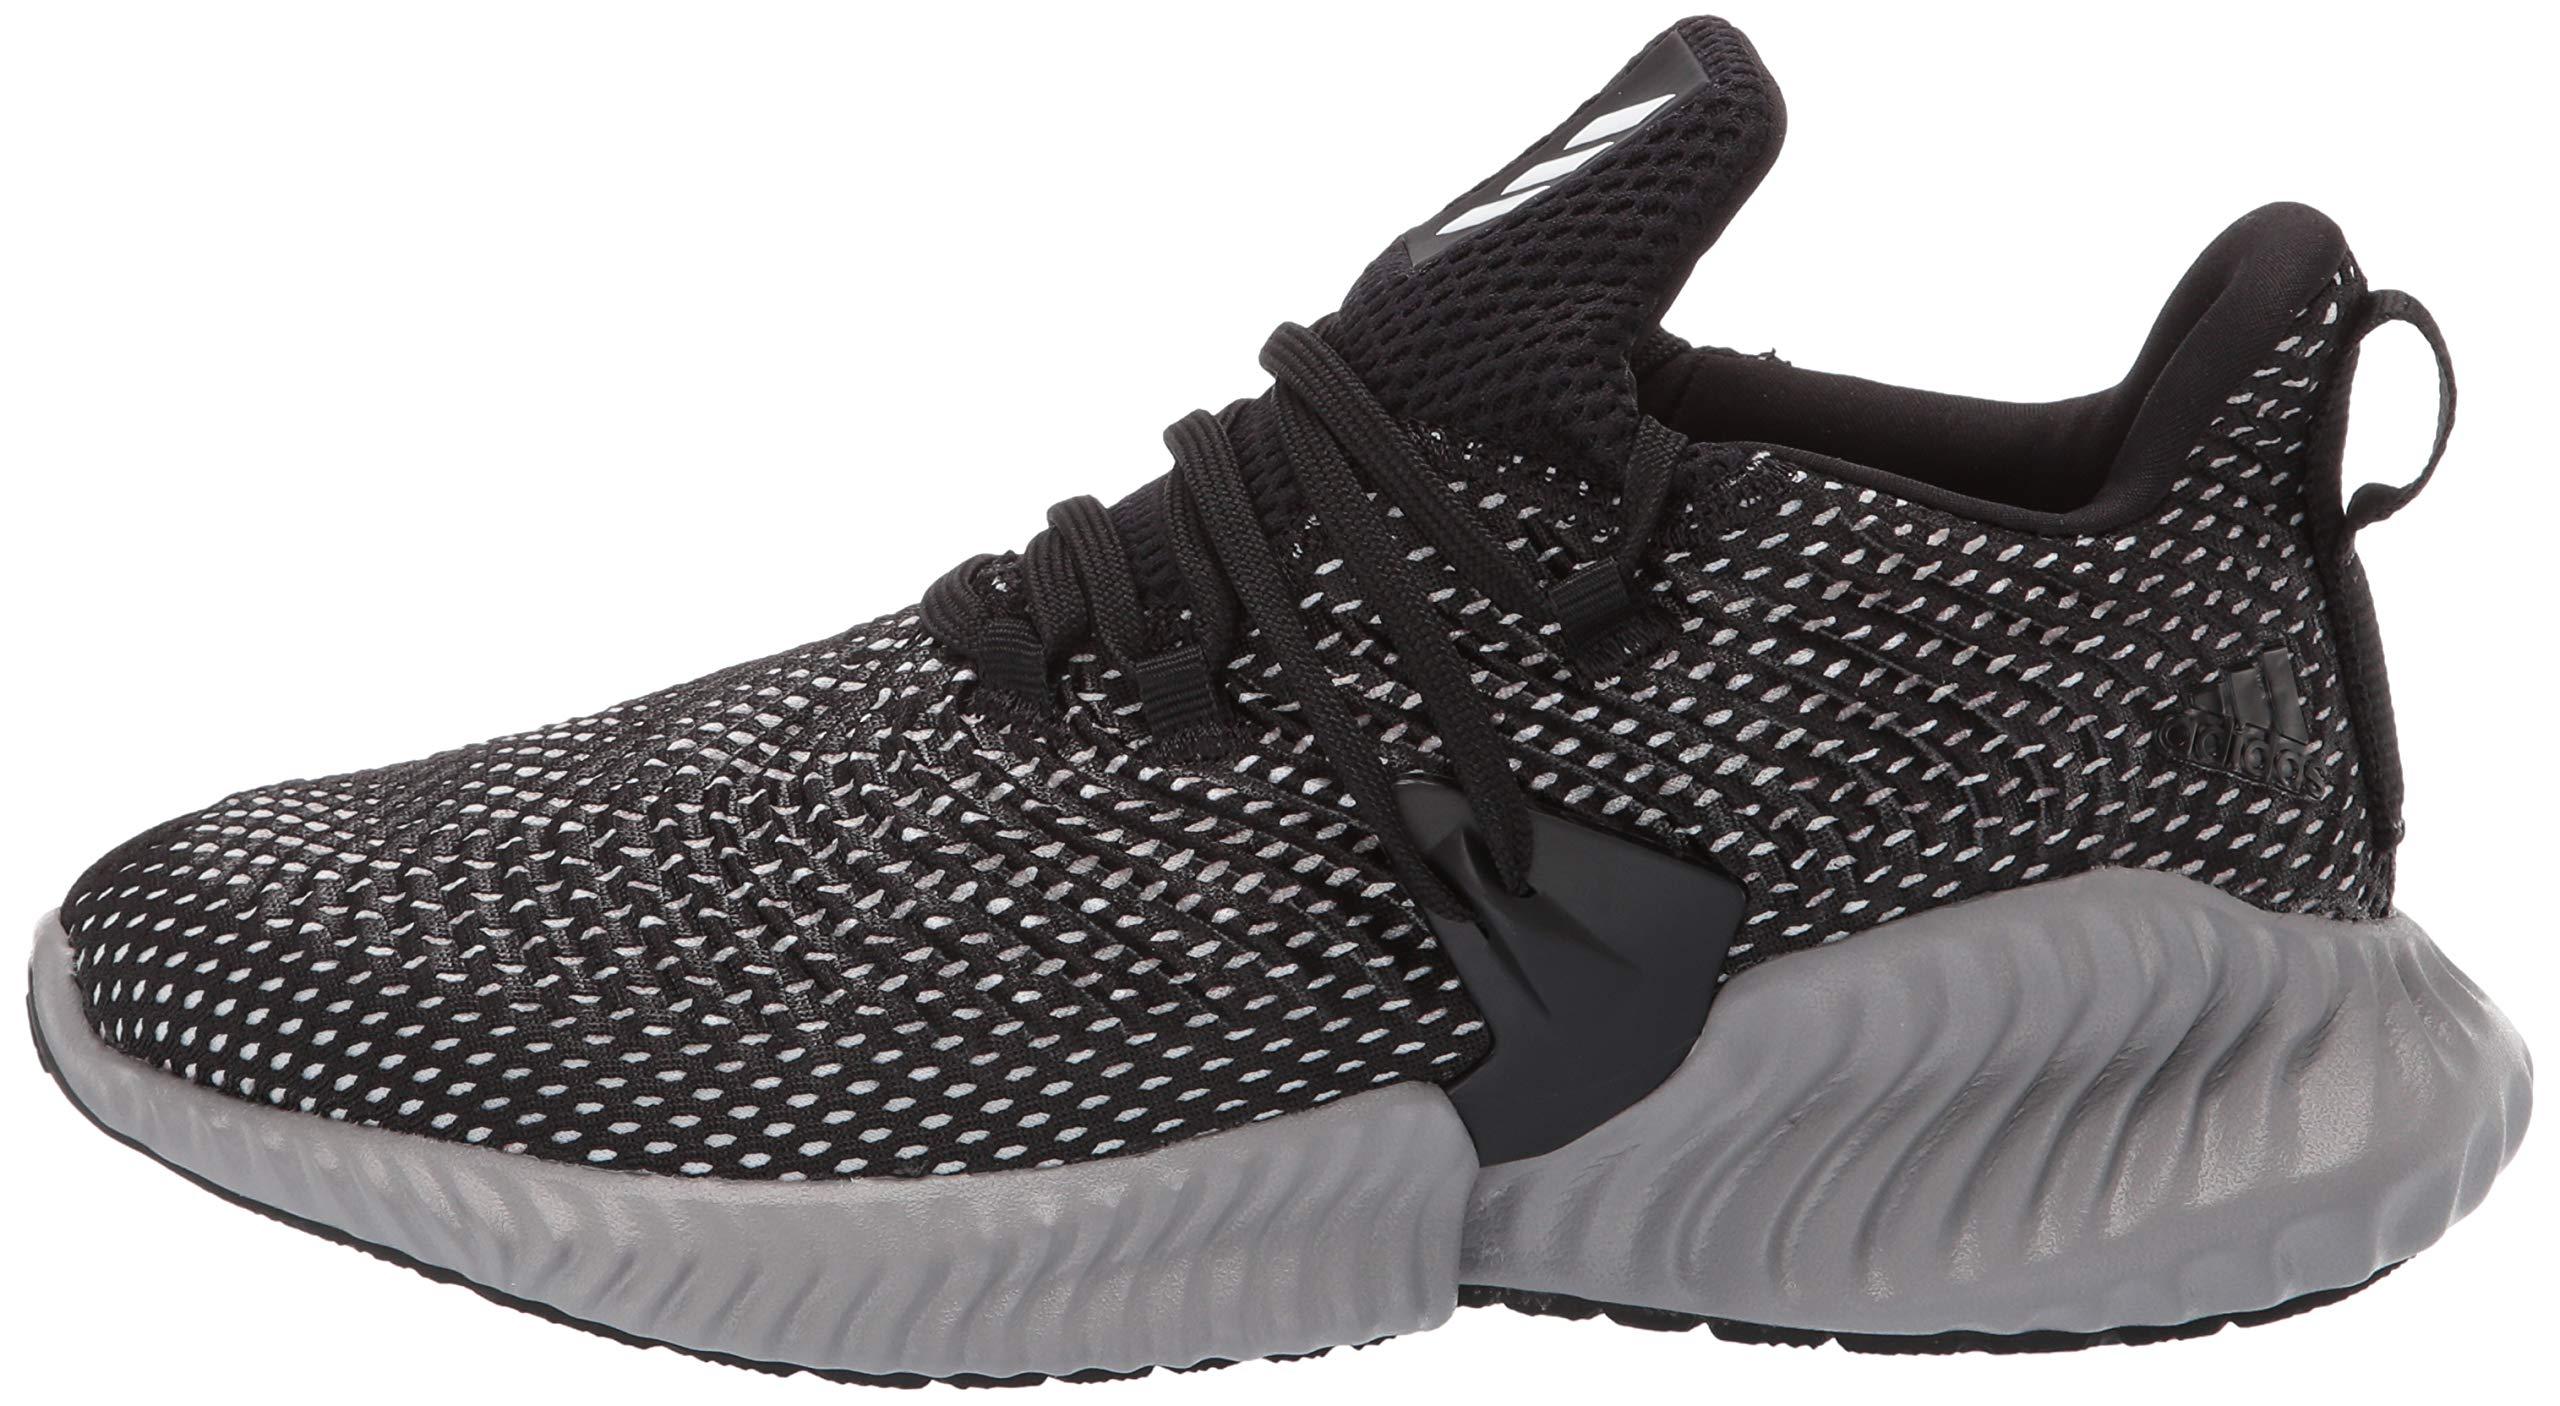 Adidas Kids Alphabounce Instinct, Black/White/Grey, 1 M US Little Kid by adidas (Image #5)